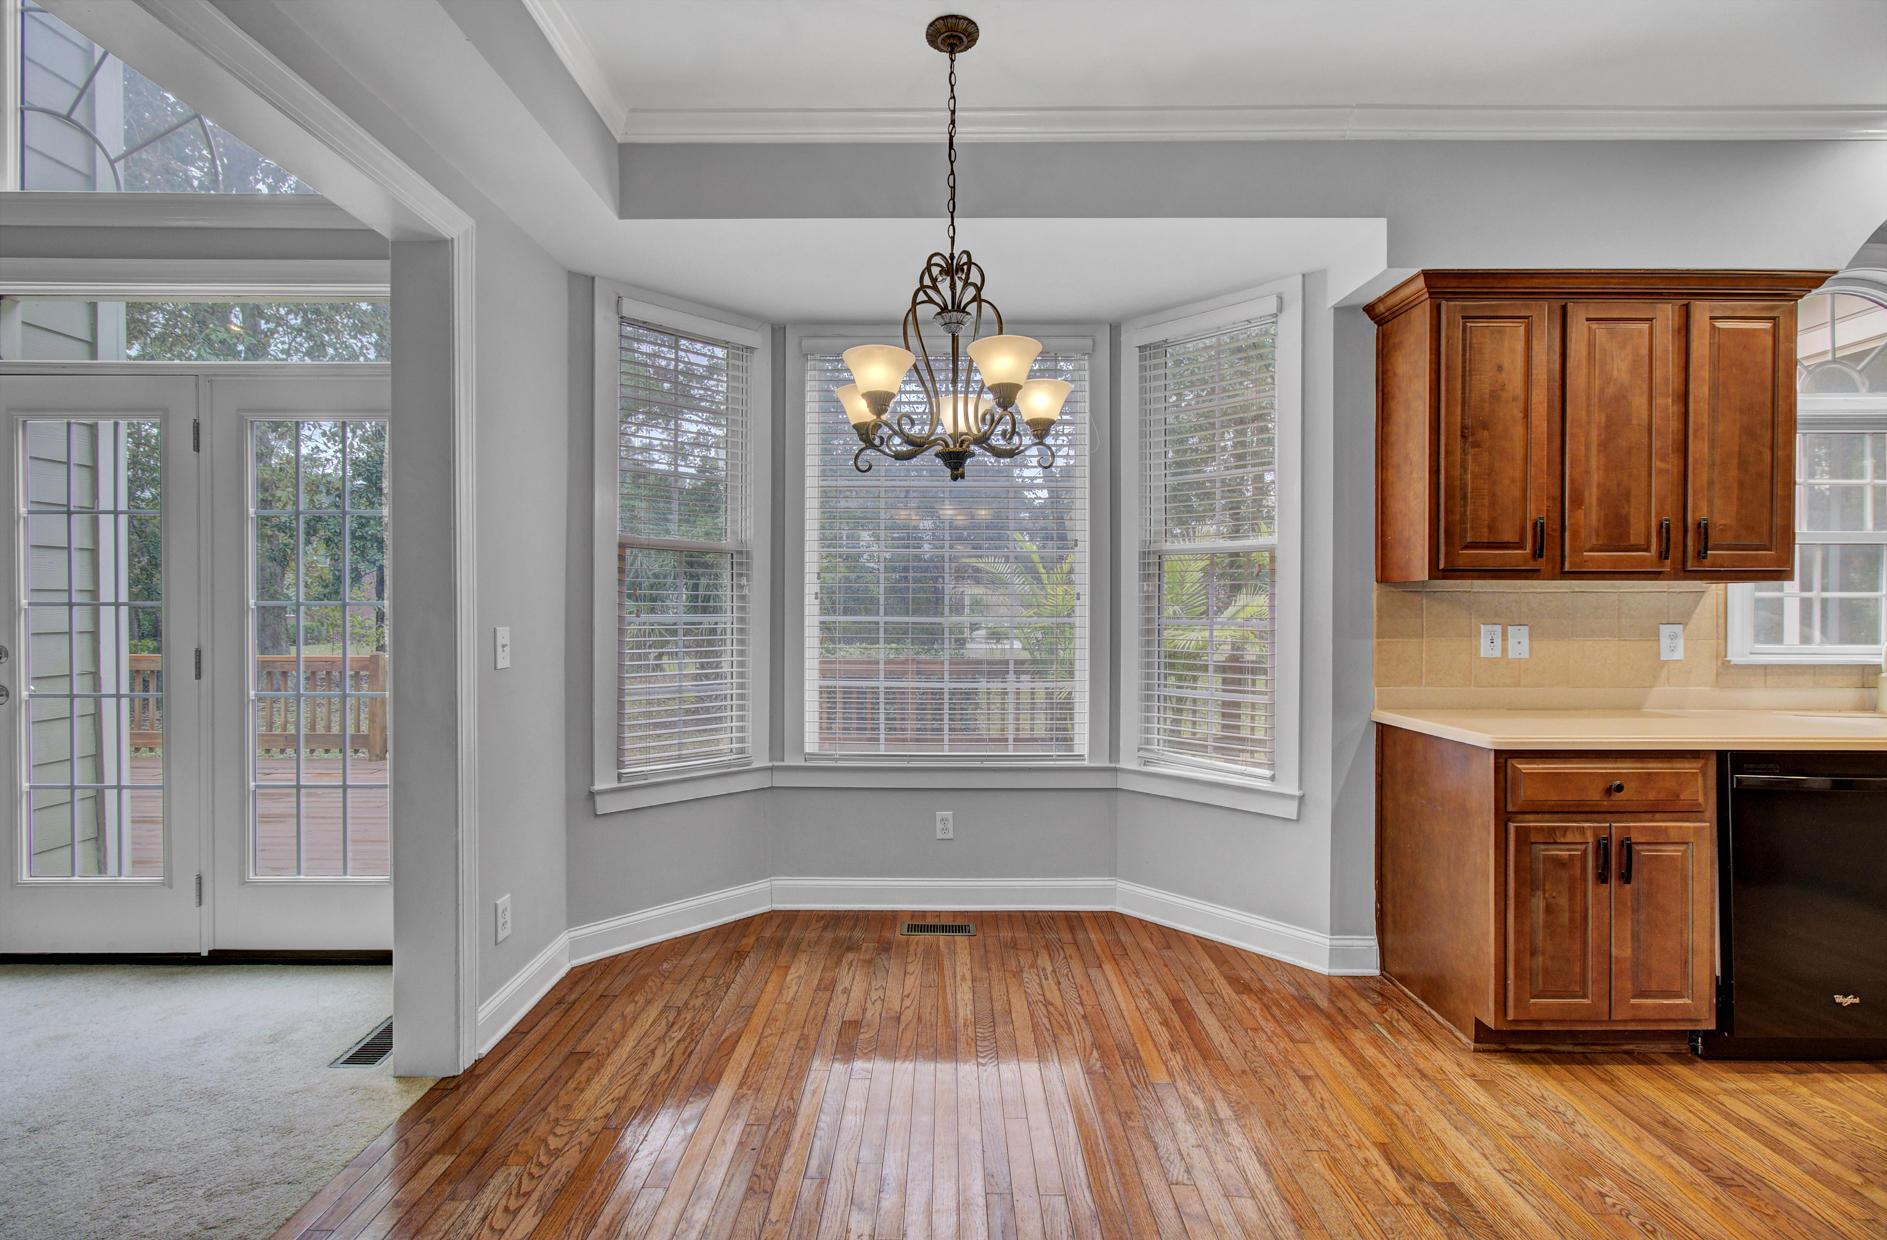 Dunes West Homes For Sale - 2321 Darts Cove, Mount Pleasant, SC - 13